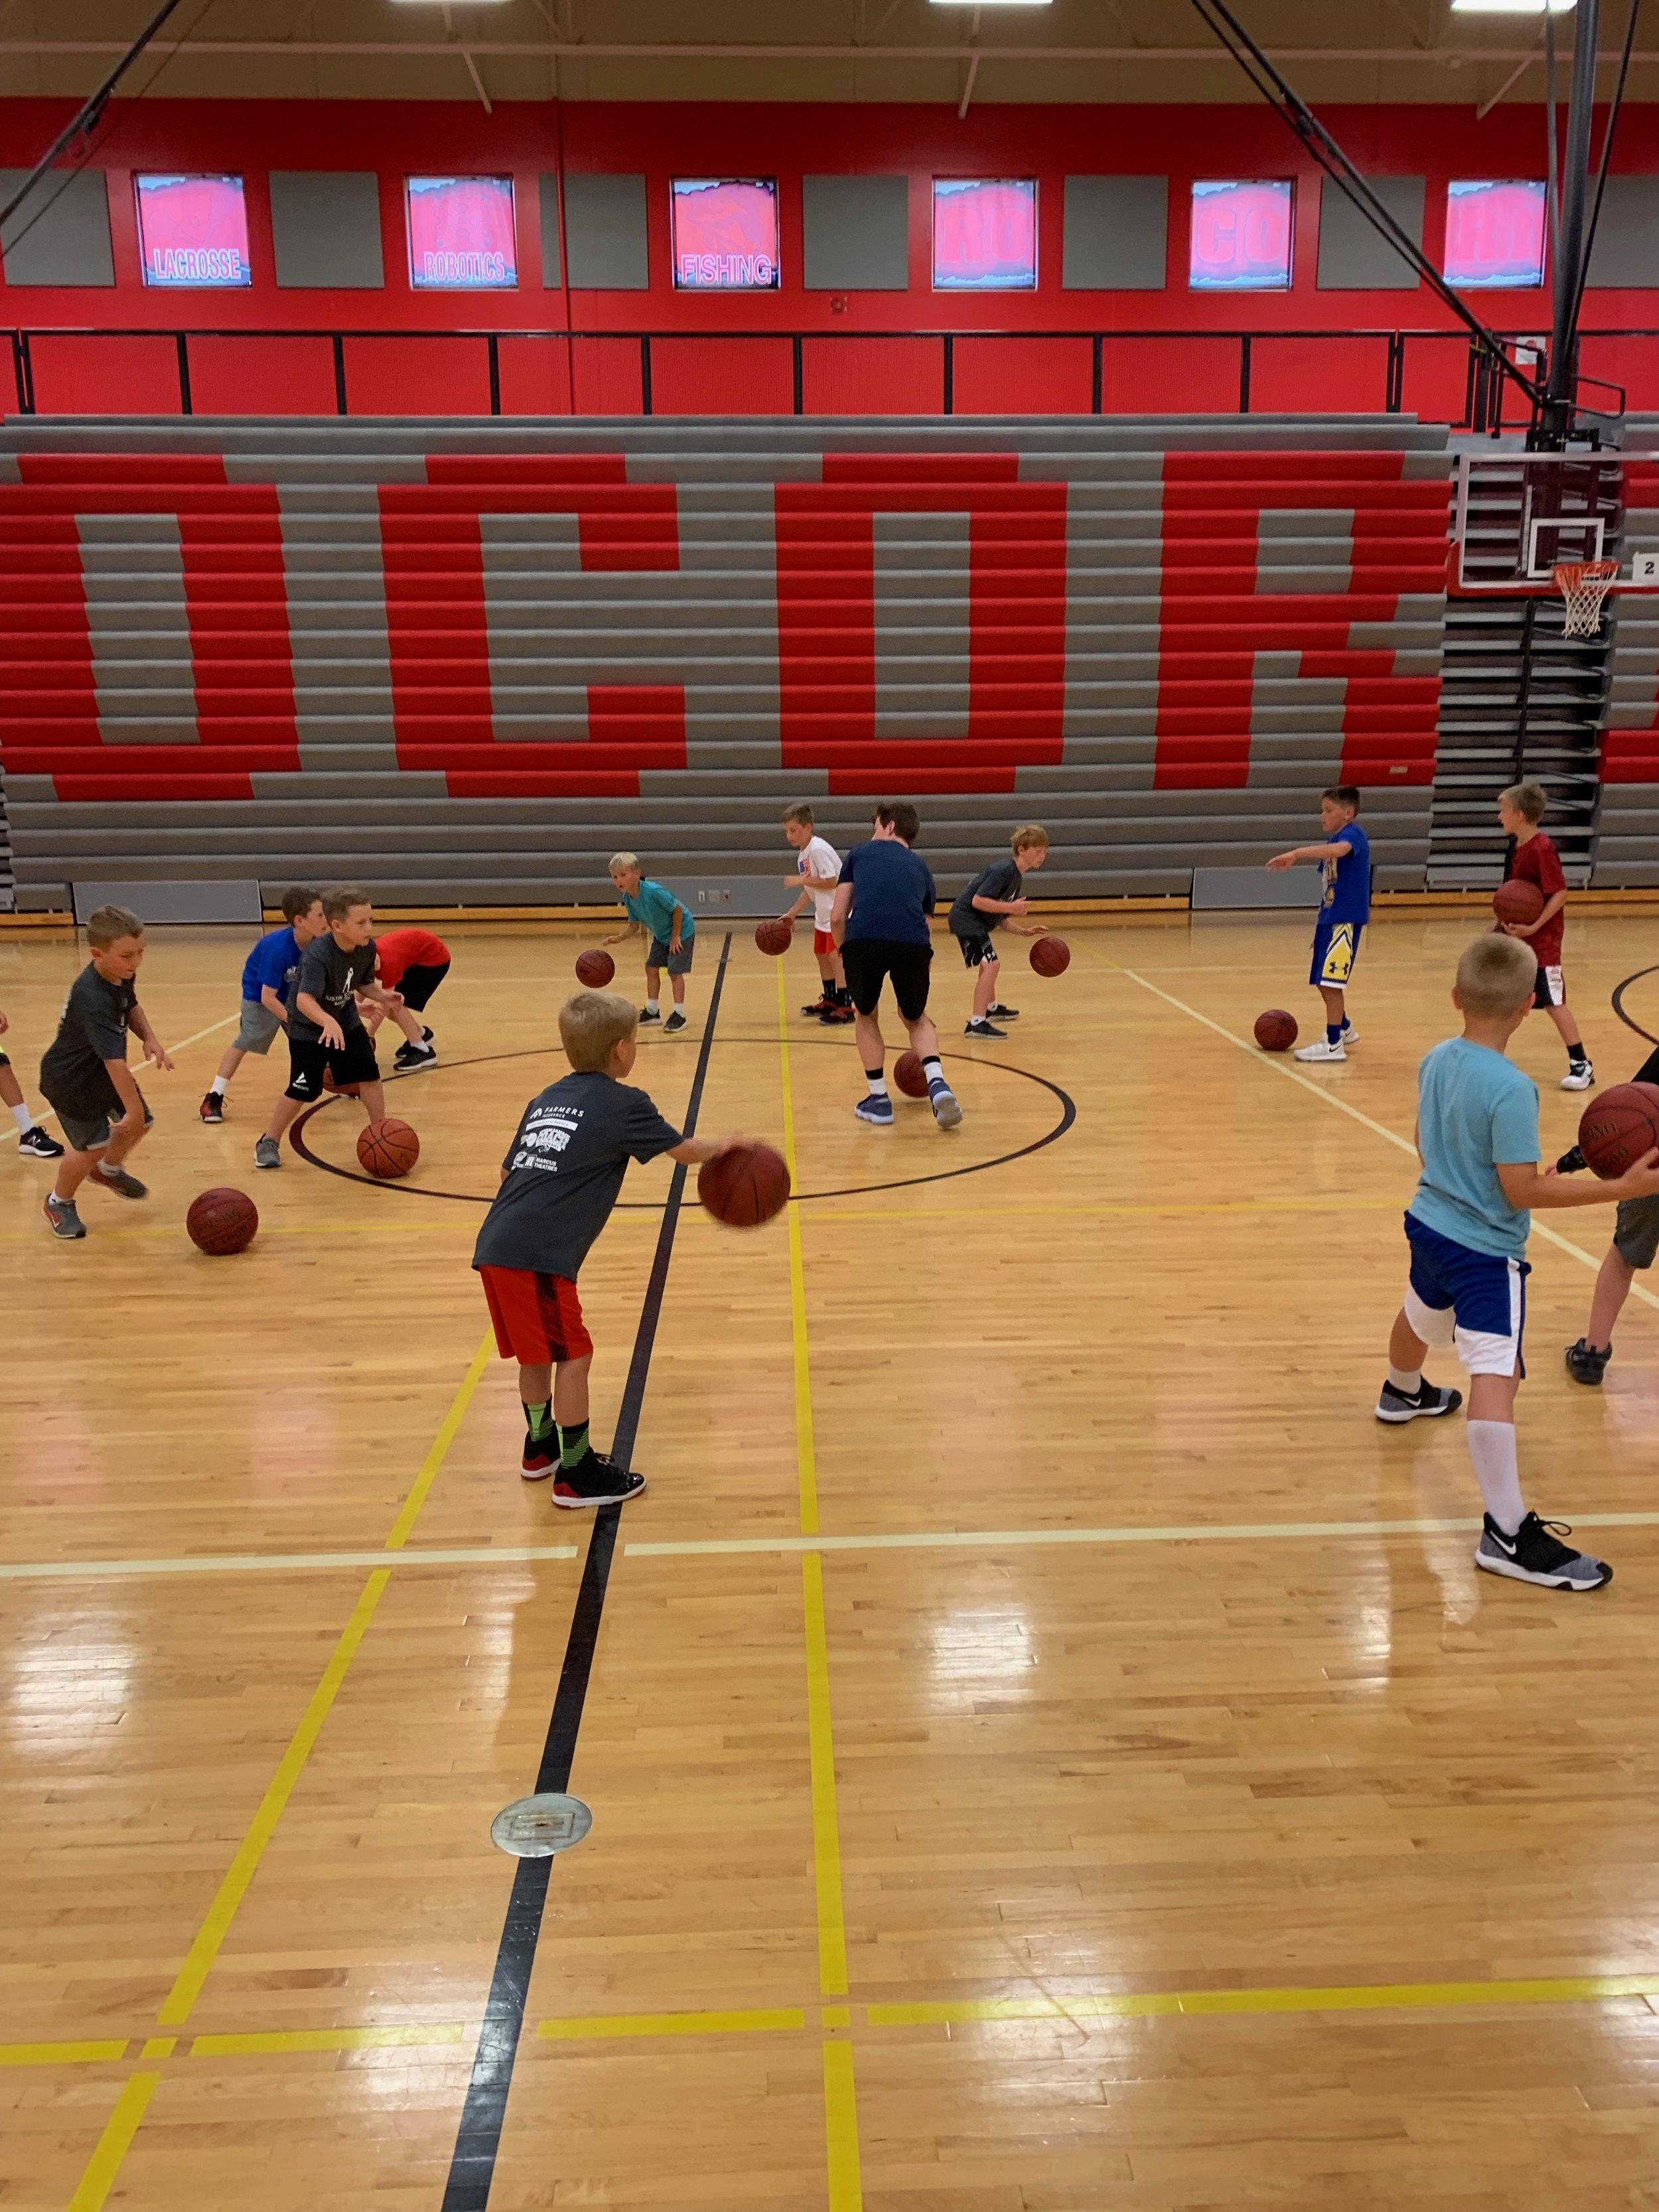 Justin+Stommes+Basketball-+Ball+Handling+2019